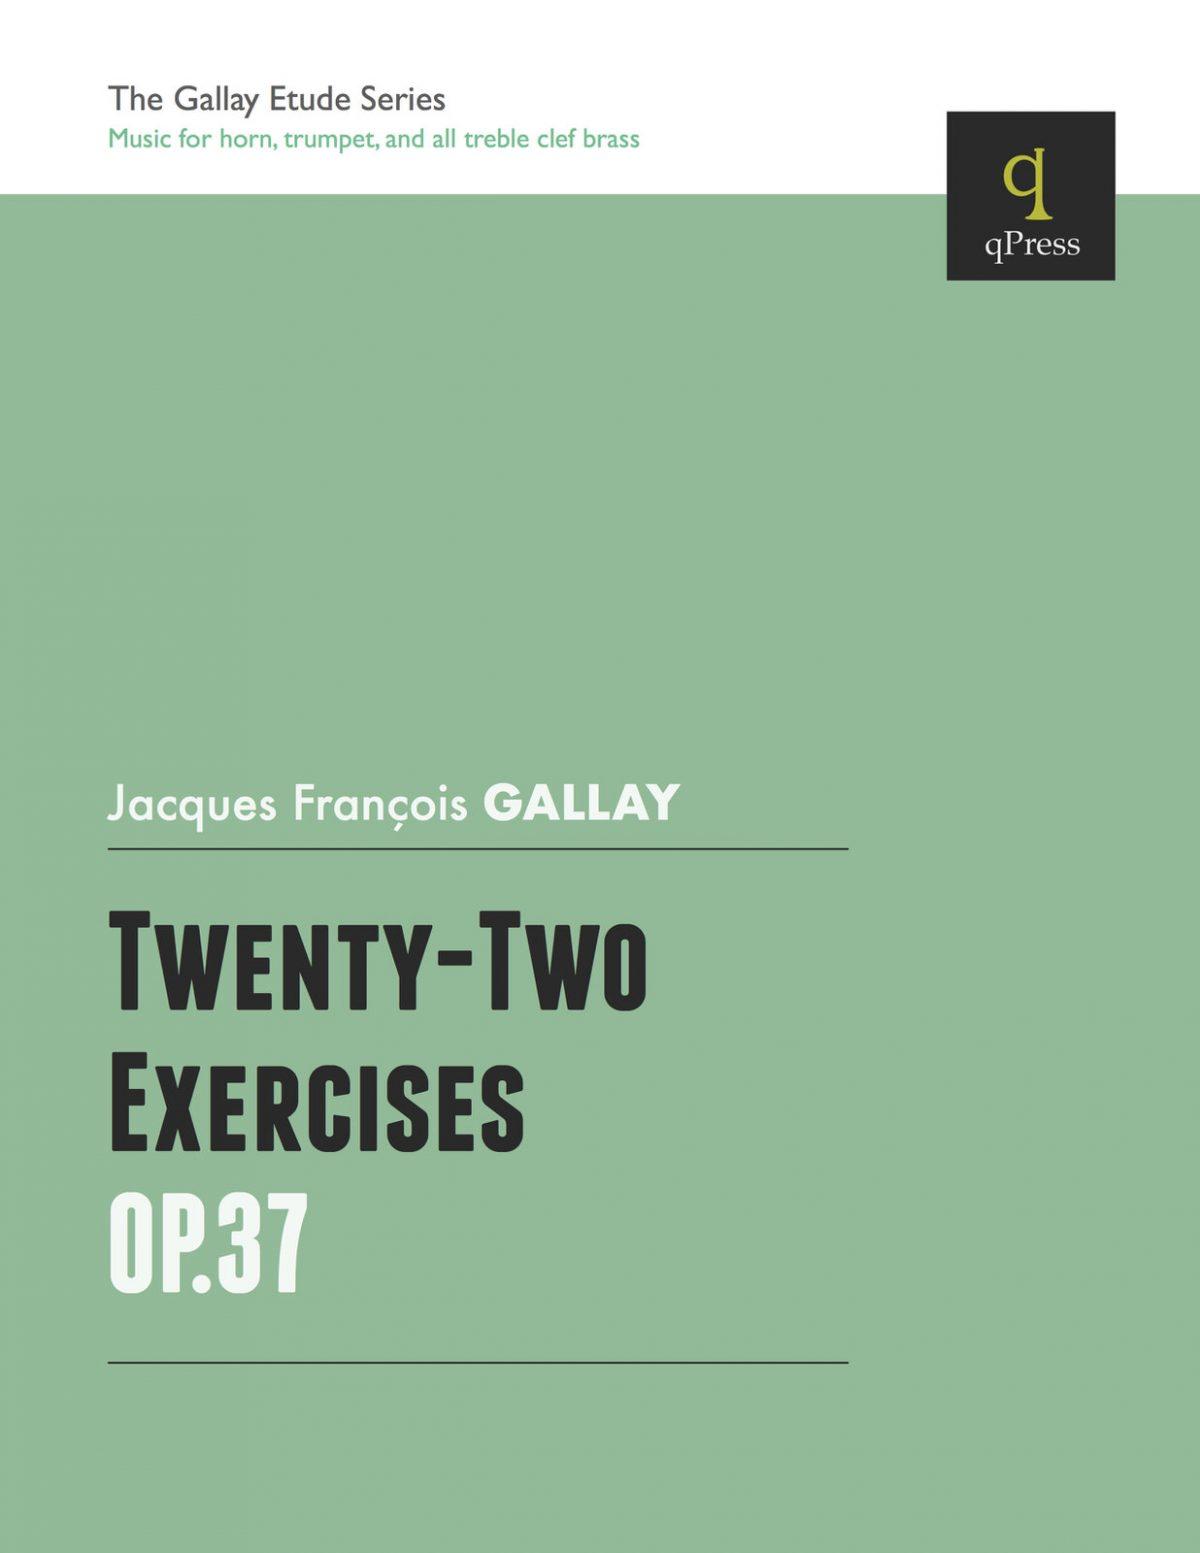 gallay-vingt-deux-exercices